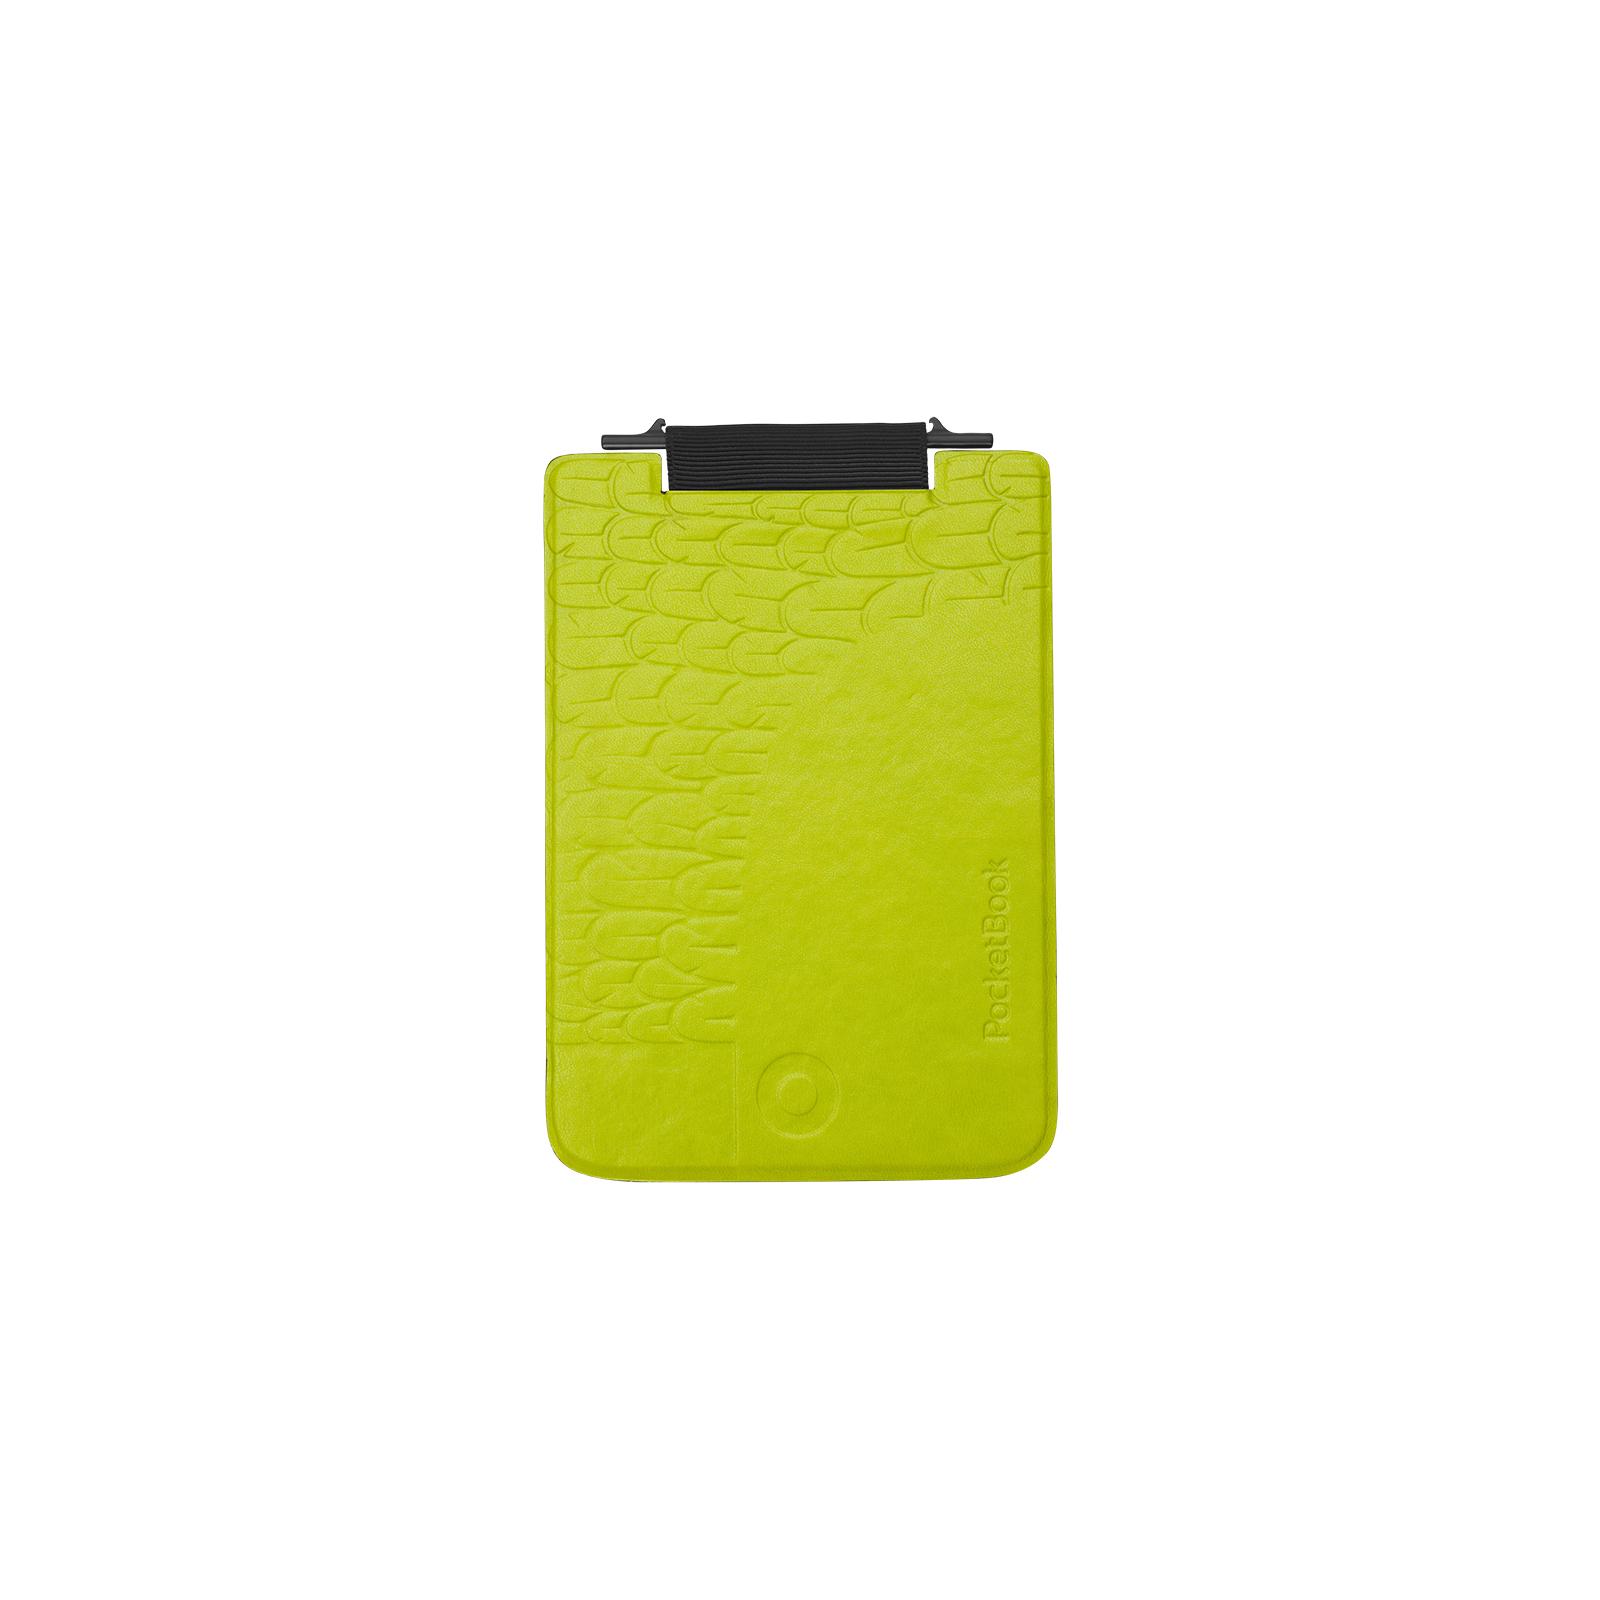 Чехол для электронной книги PocketBook PB515 Mini Bird green/black (PBPUC-5-GRBC-BD)